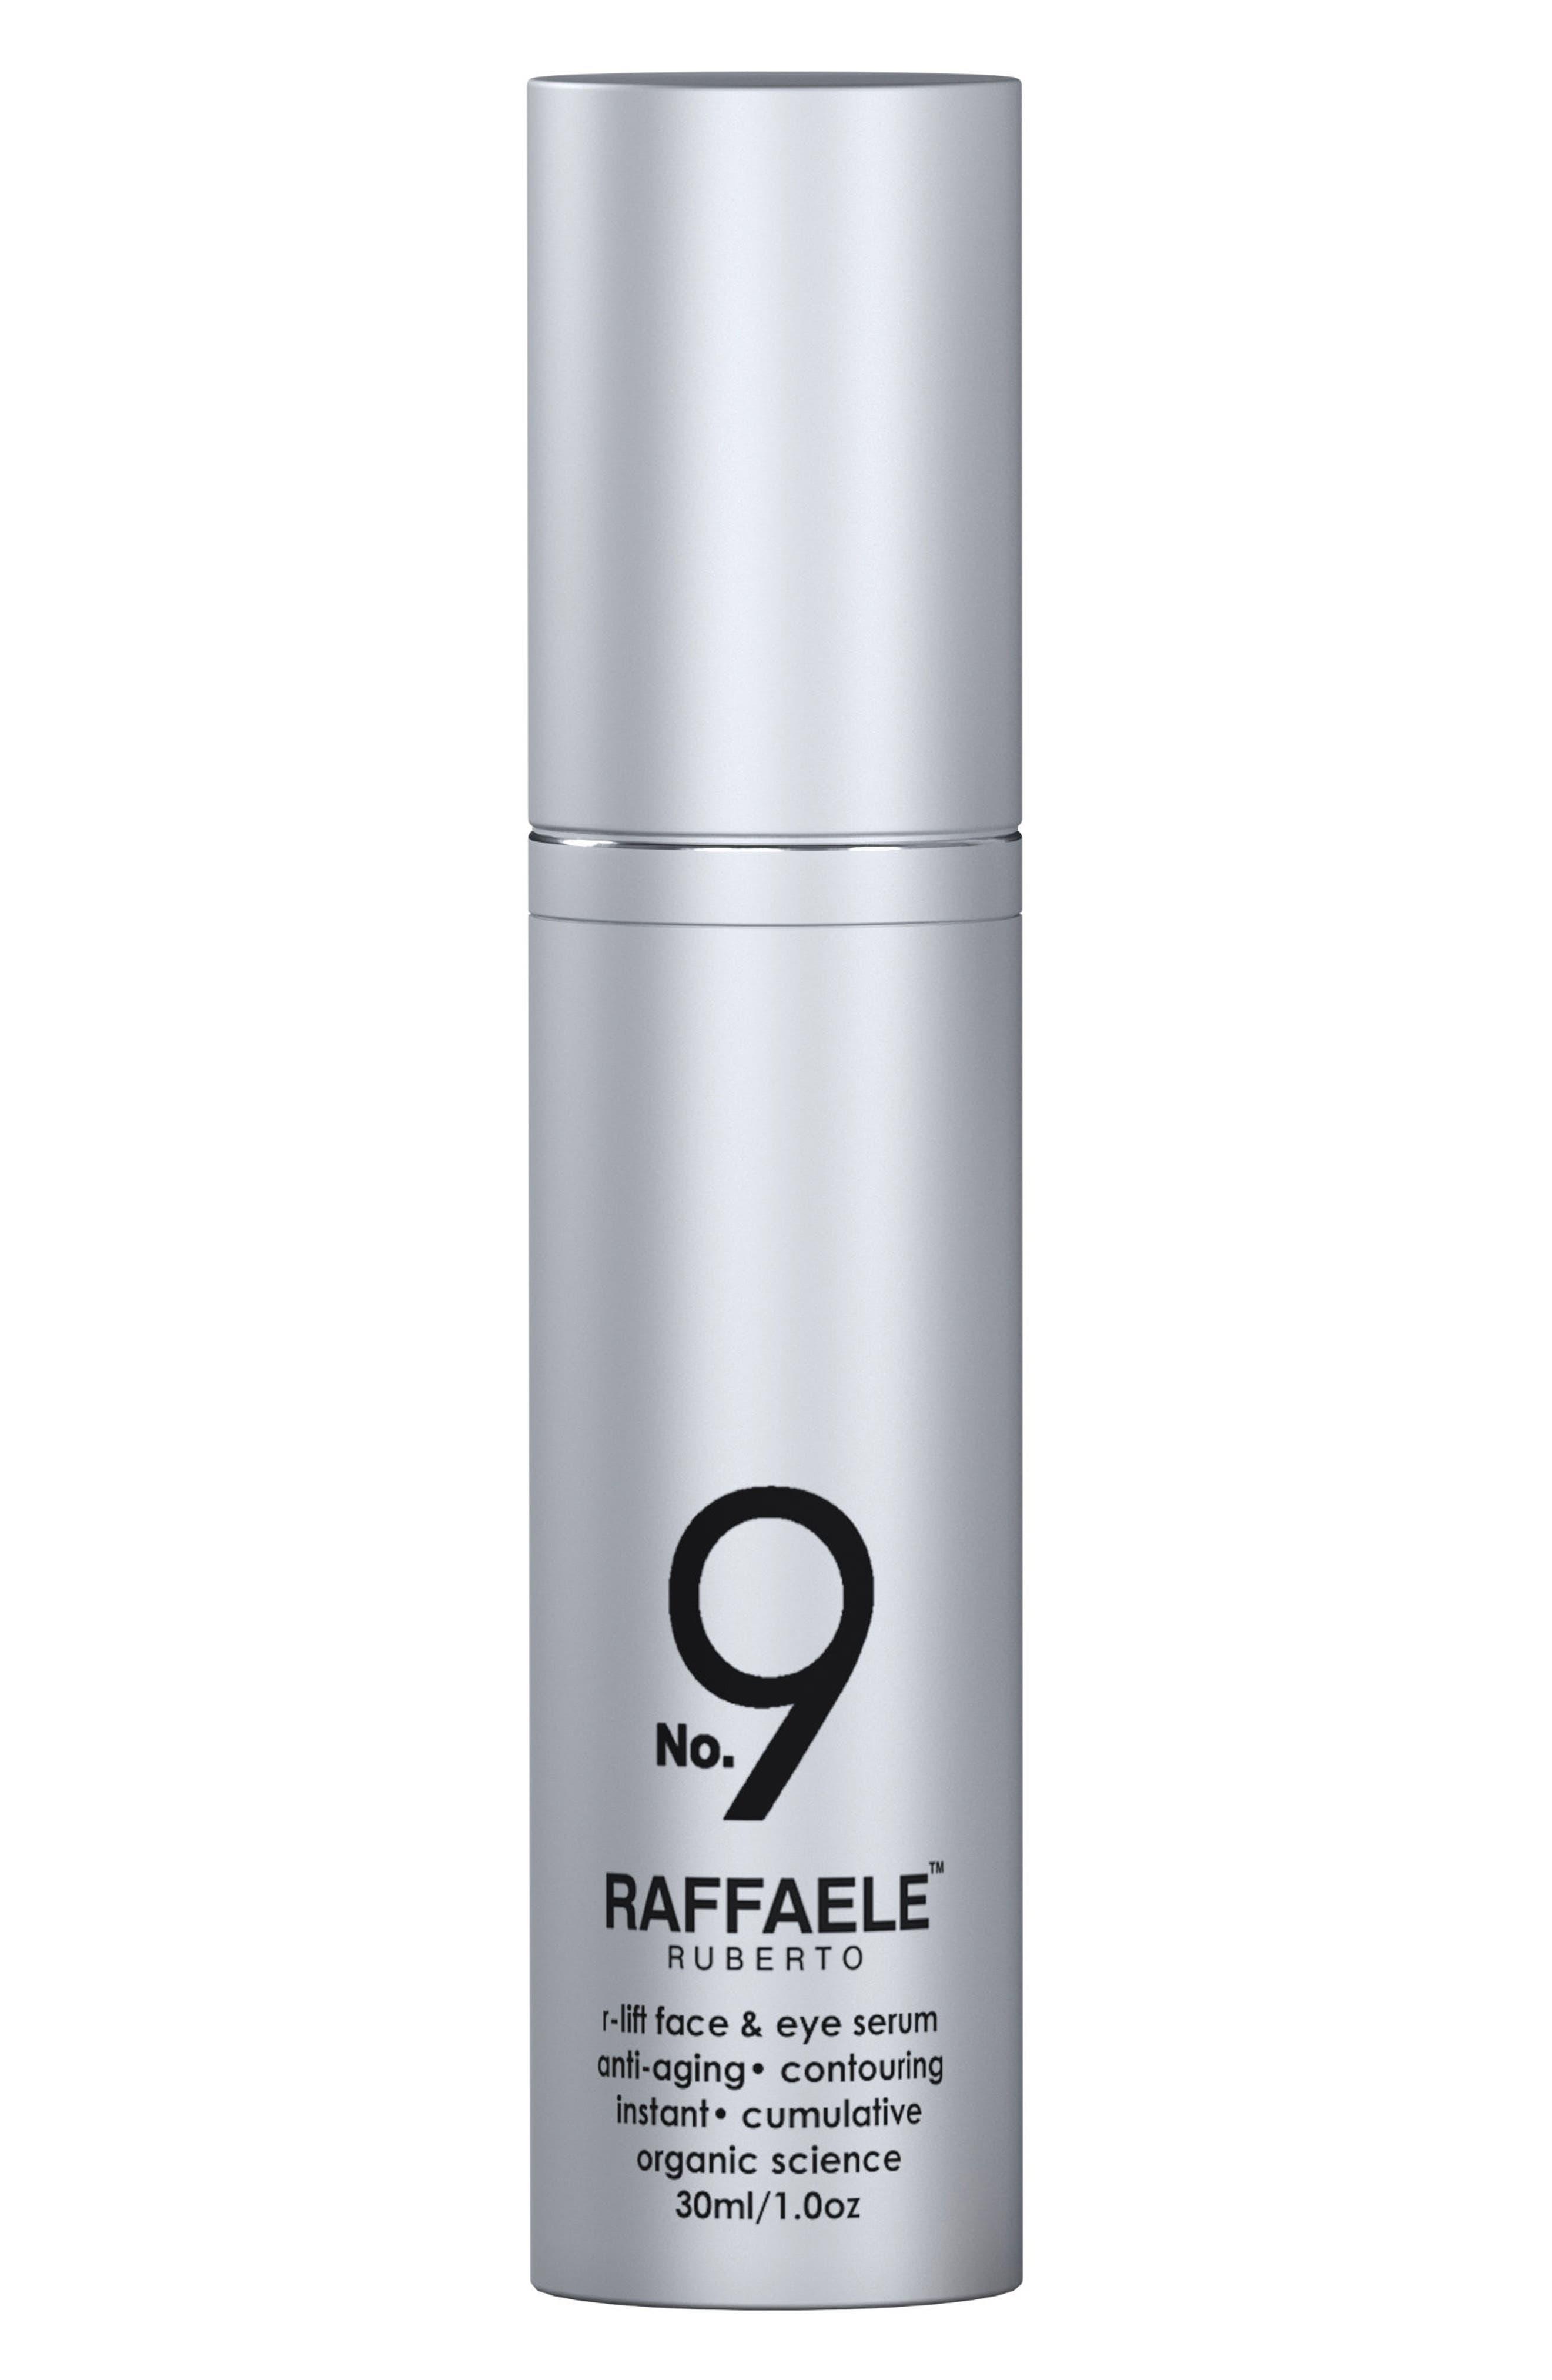 Main Image - Raffaele Ruberto® SKIN Formula No. 9 R-lift Face & Eye Serum